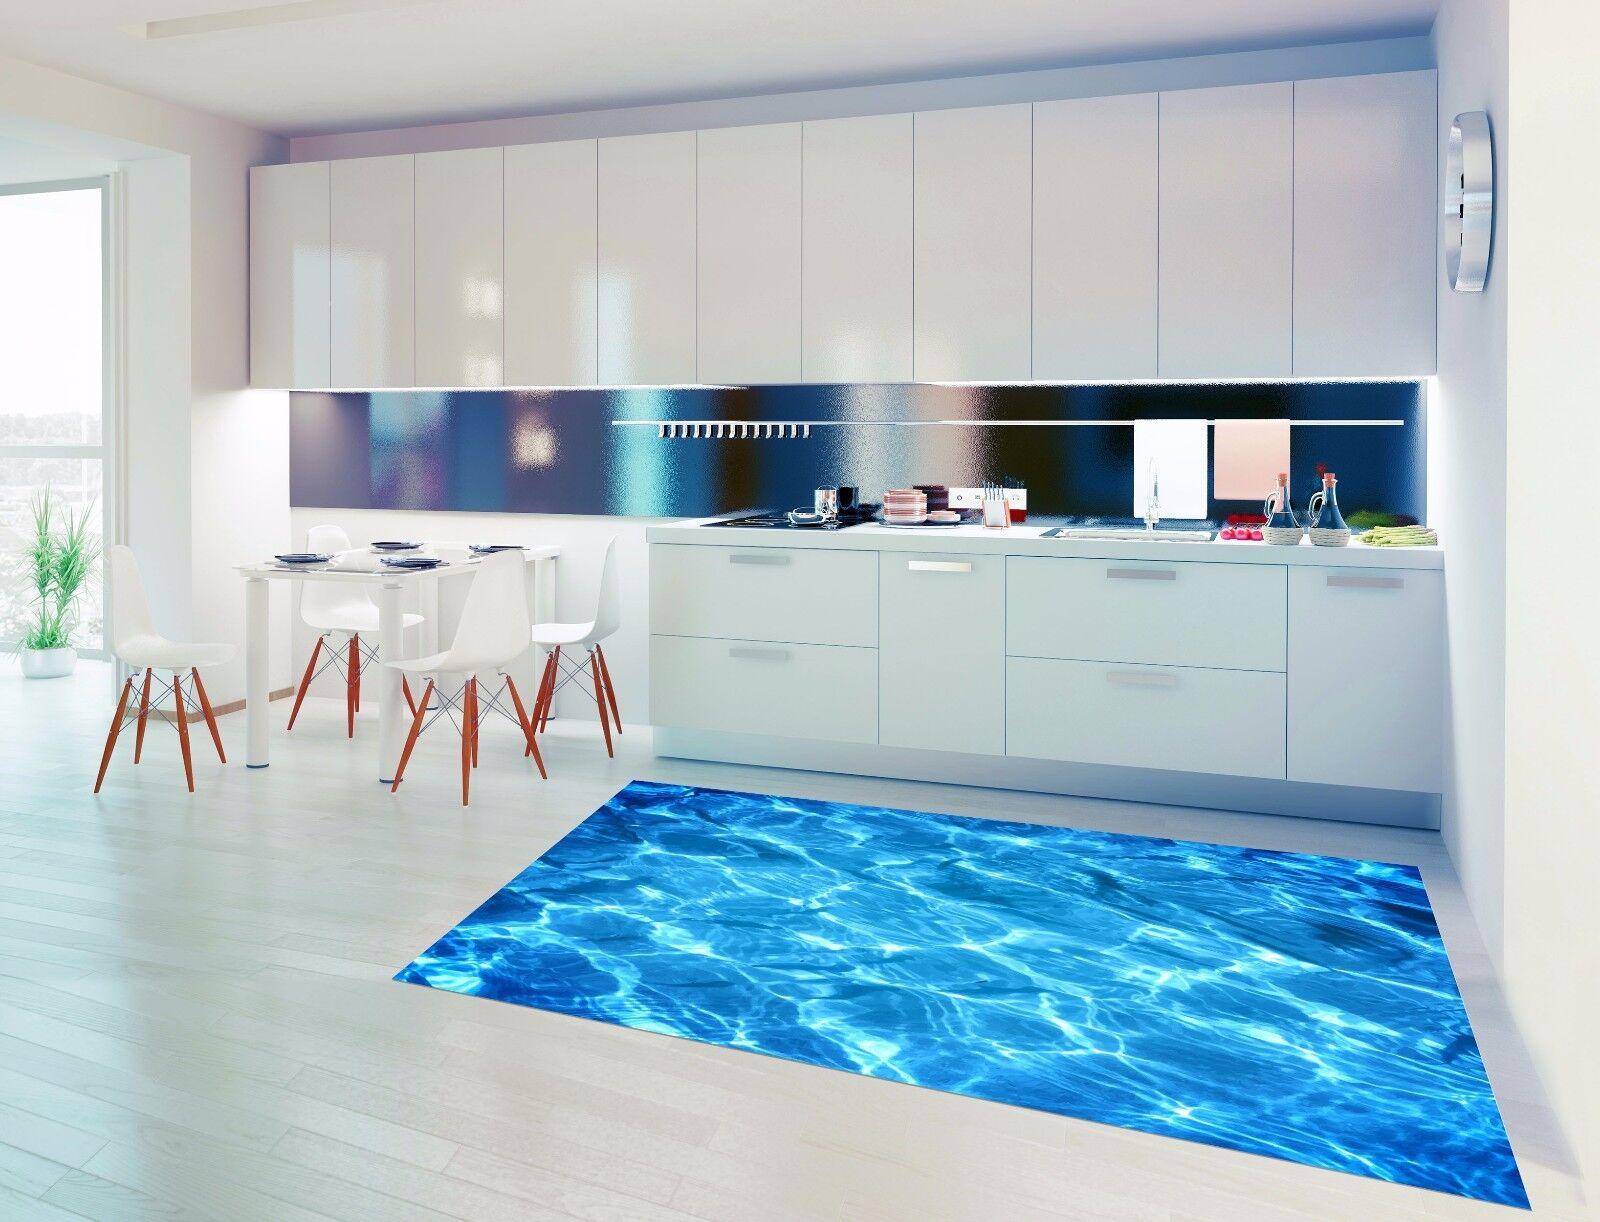 3D Blau River Ripple 788 Kitchen Mat Floor Murals Wall Print Wall Deco UK Carly